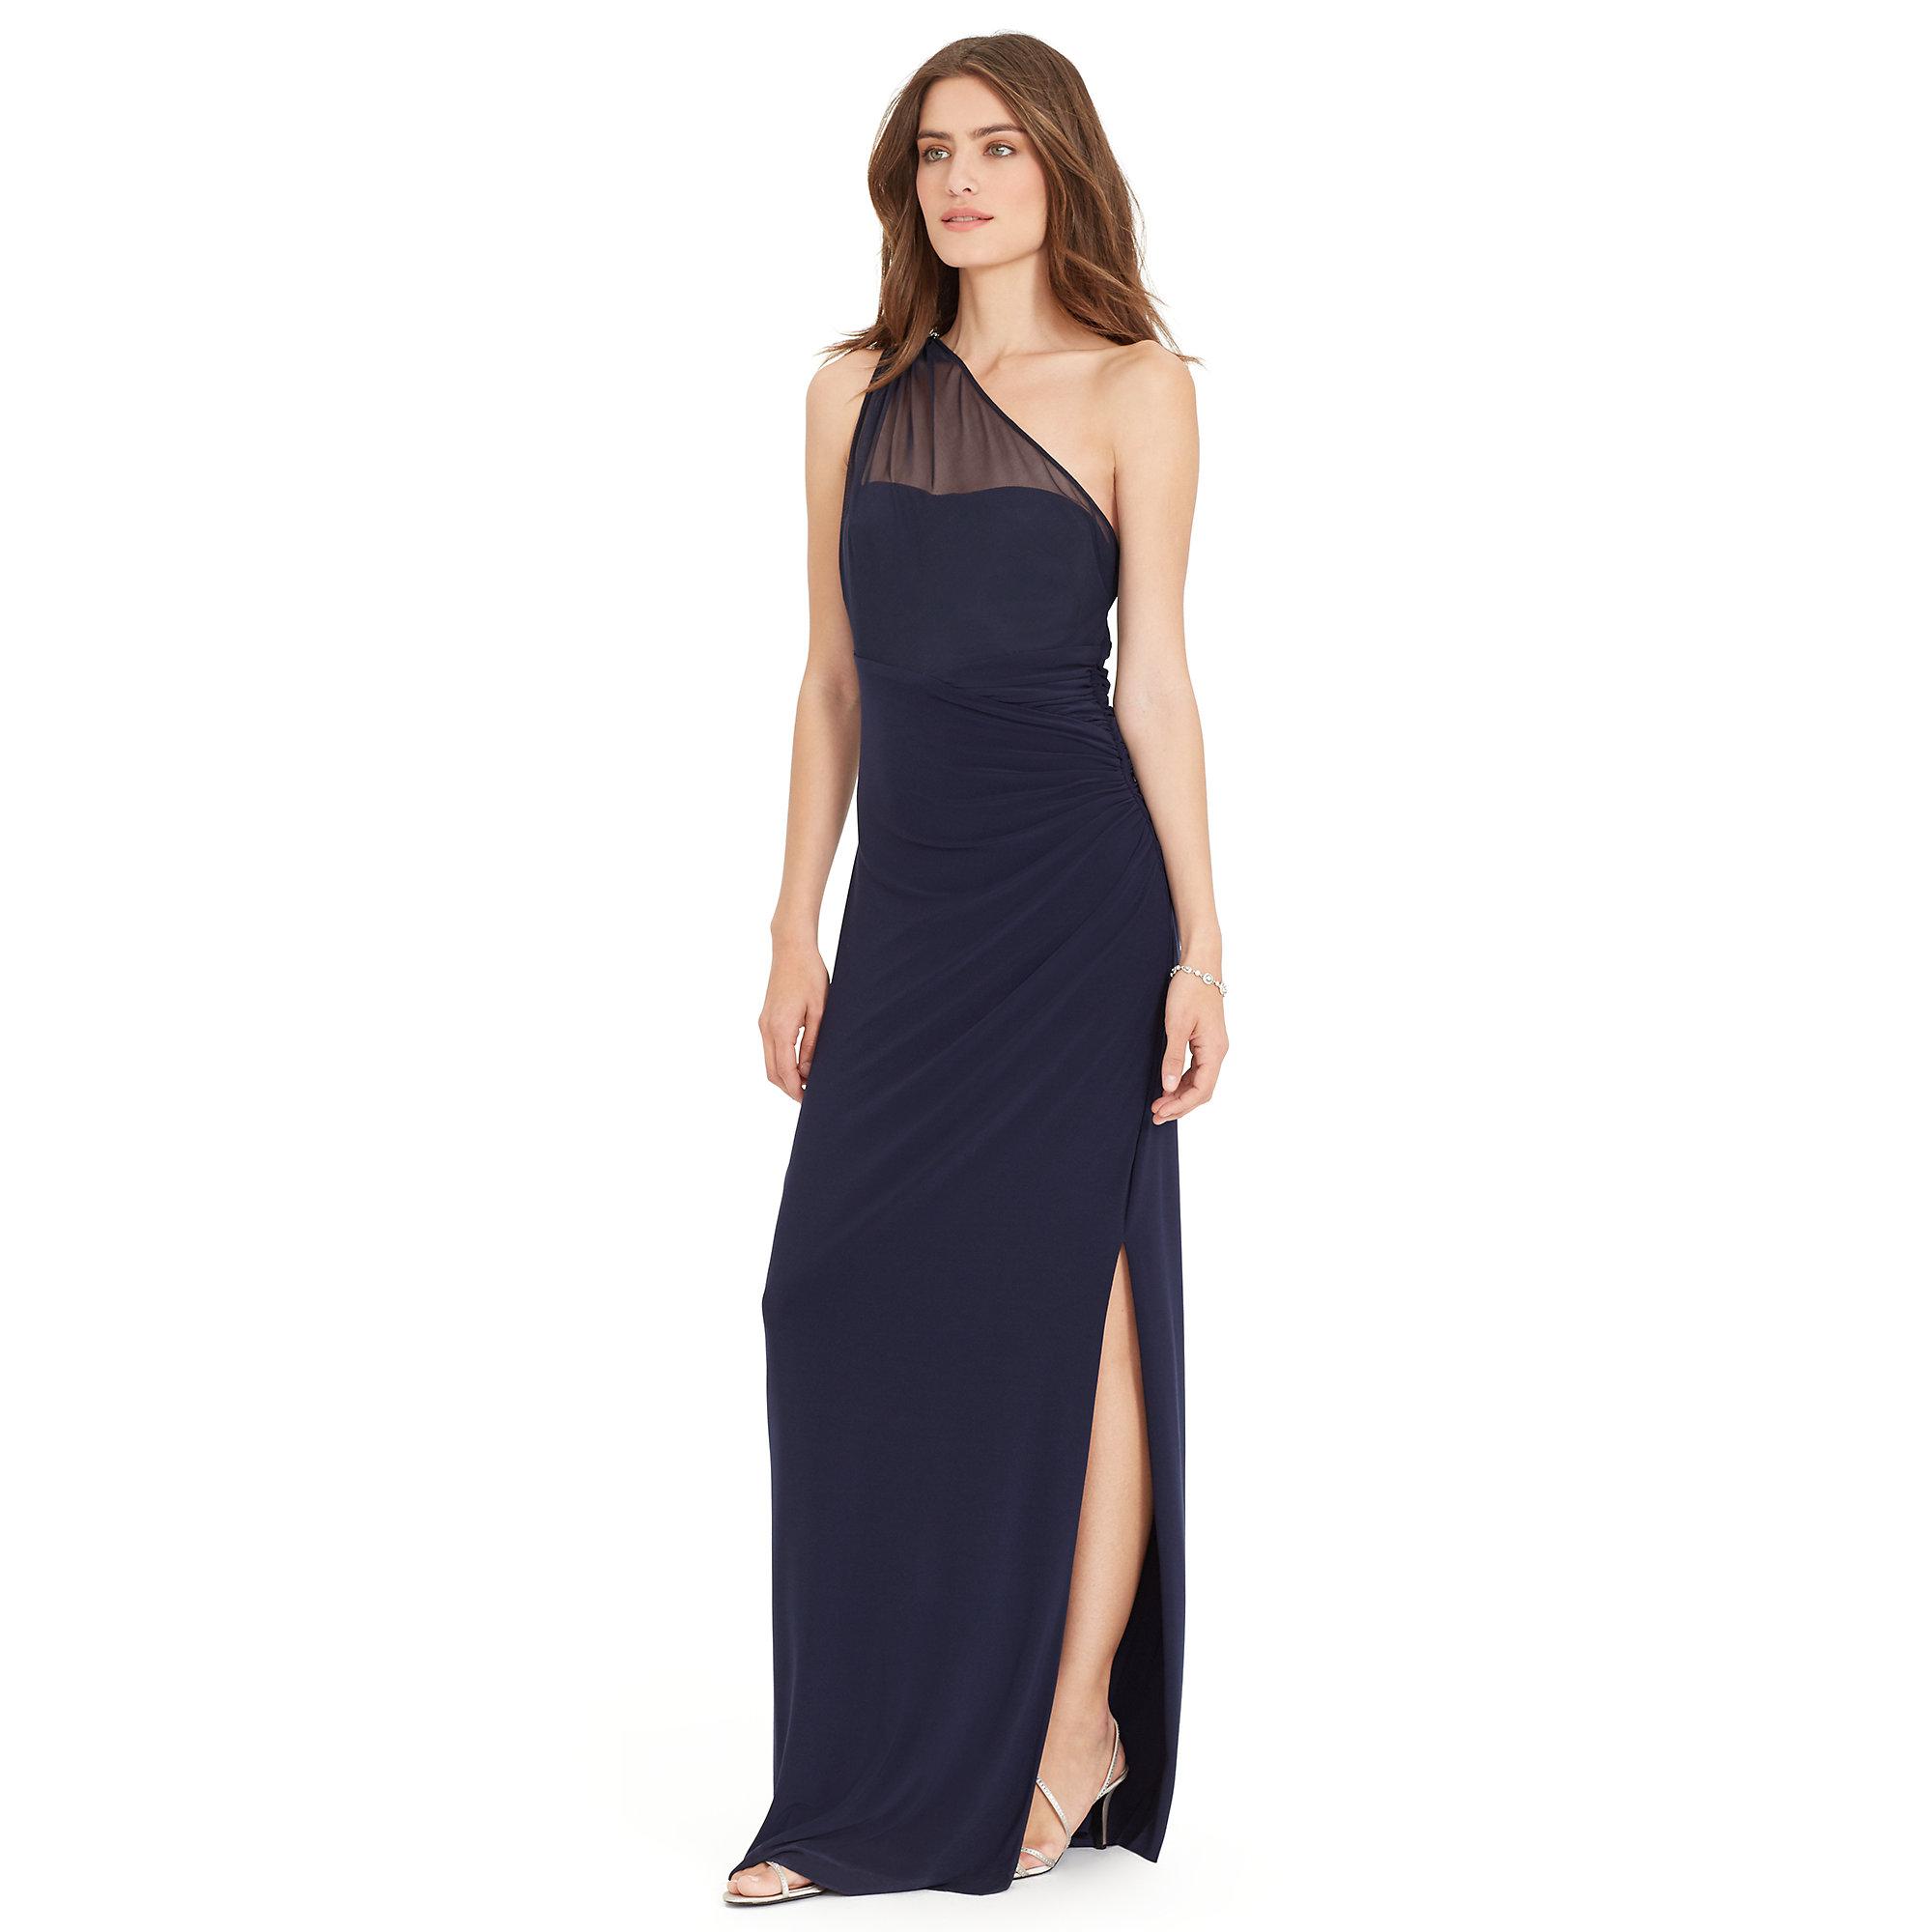 Lyst - Ralph Lauren One-shoulder Jersey Gown in Blue